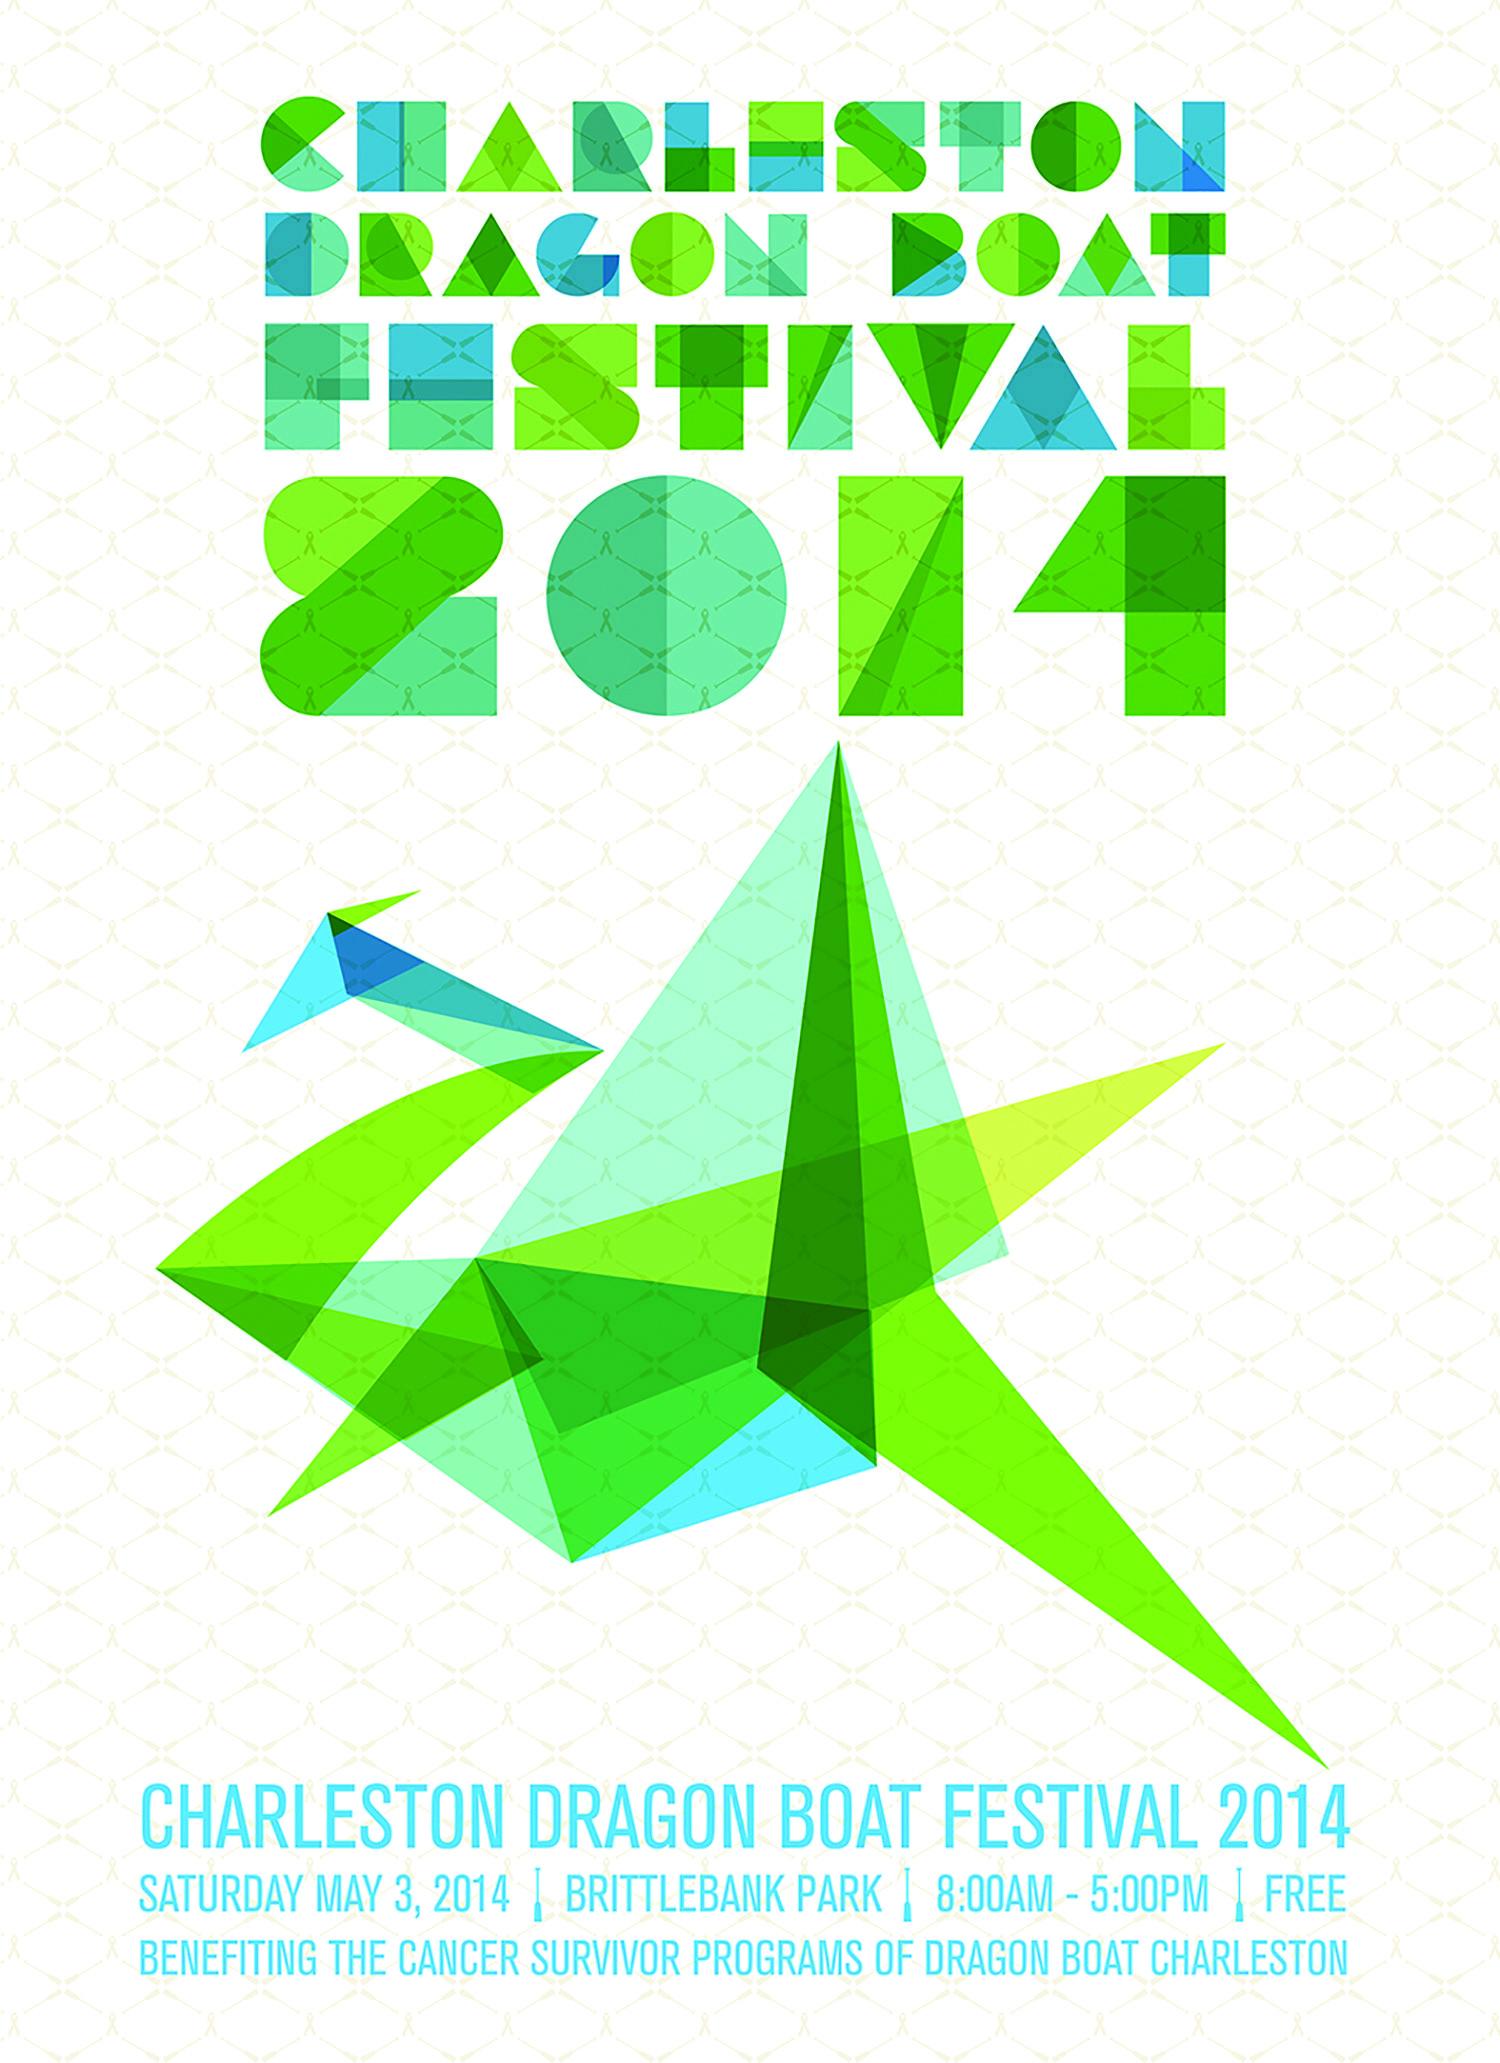 7Th Annual Charleston Dragon Boat Festival Poster Anne Herford Design,